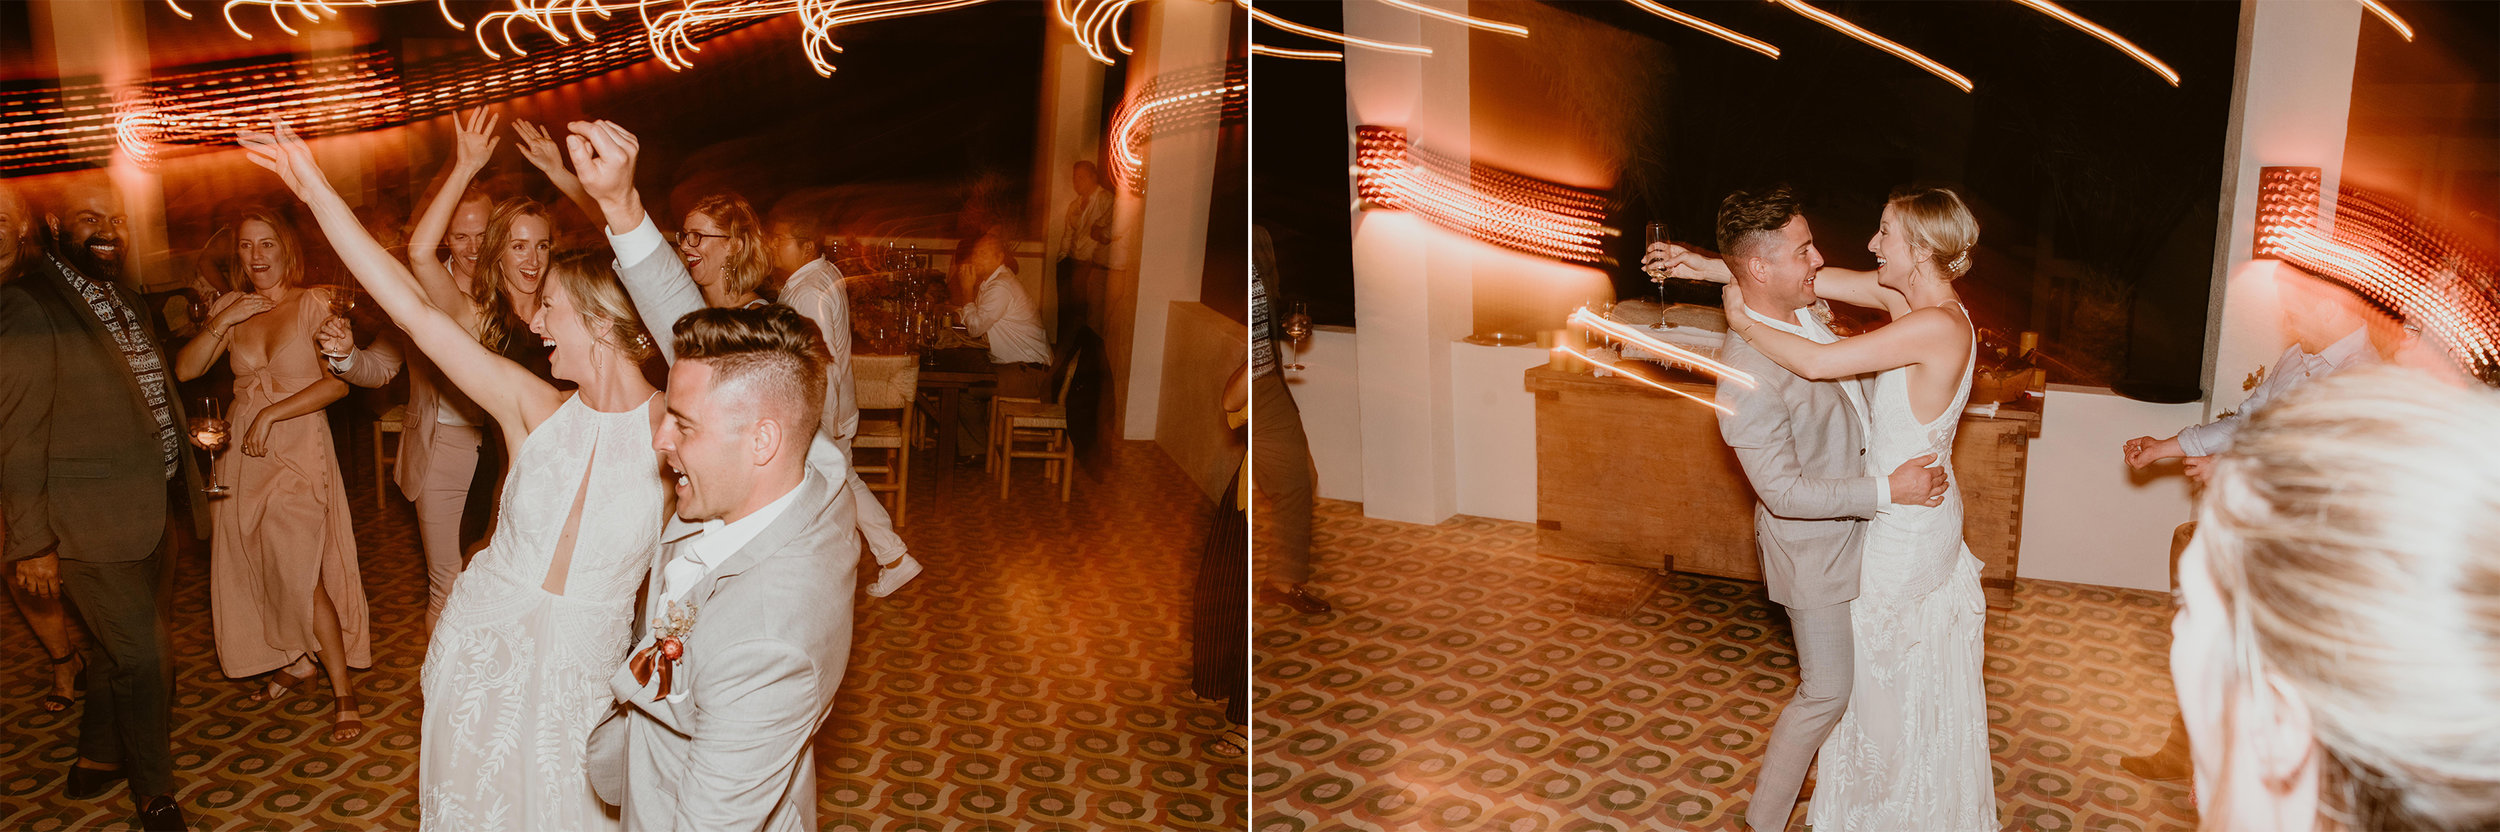 Lisa+Sam Hotel San Cristobal Wedding -557.jpg